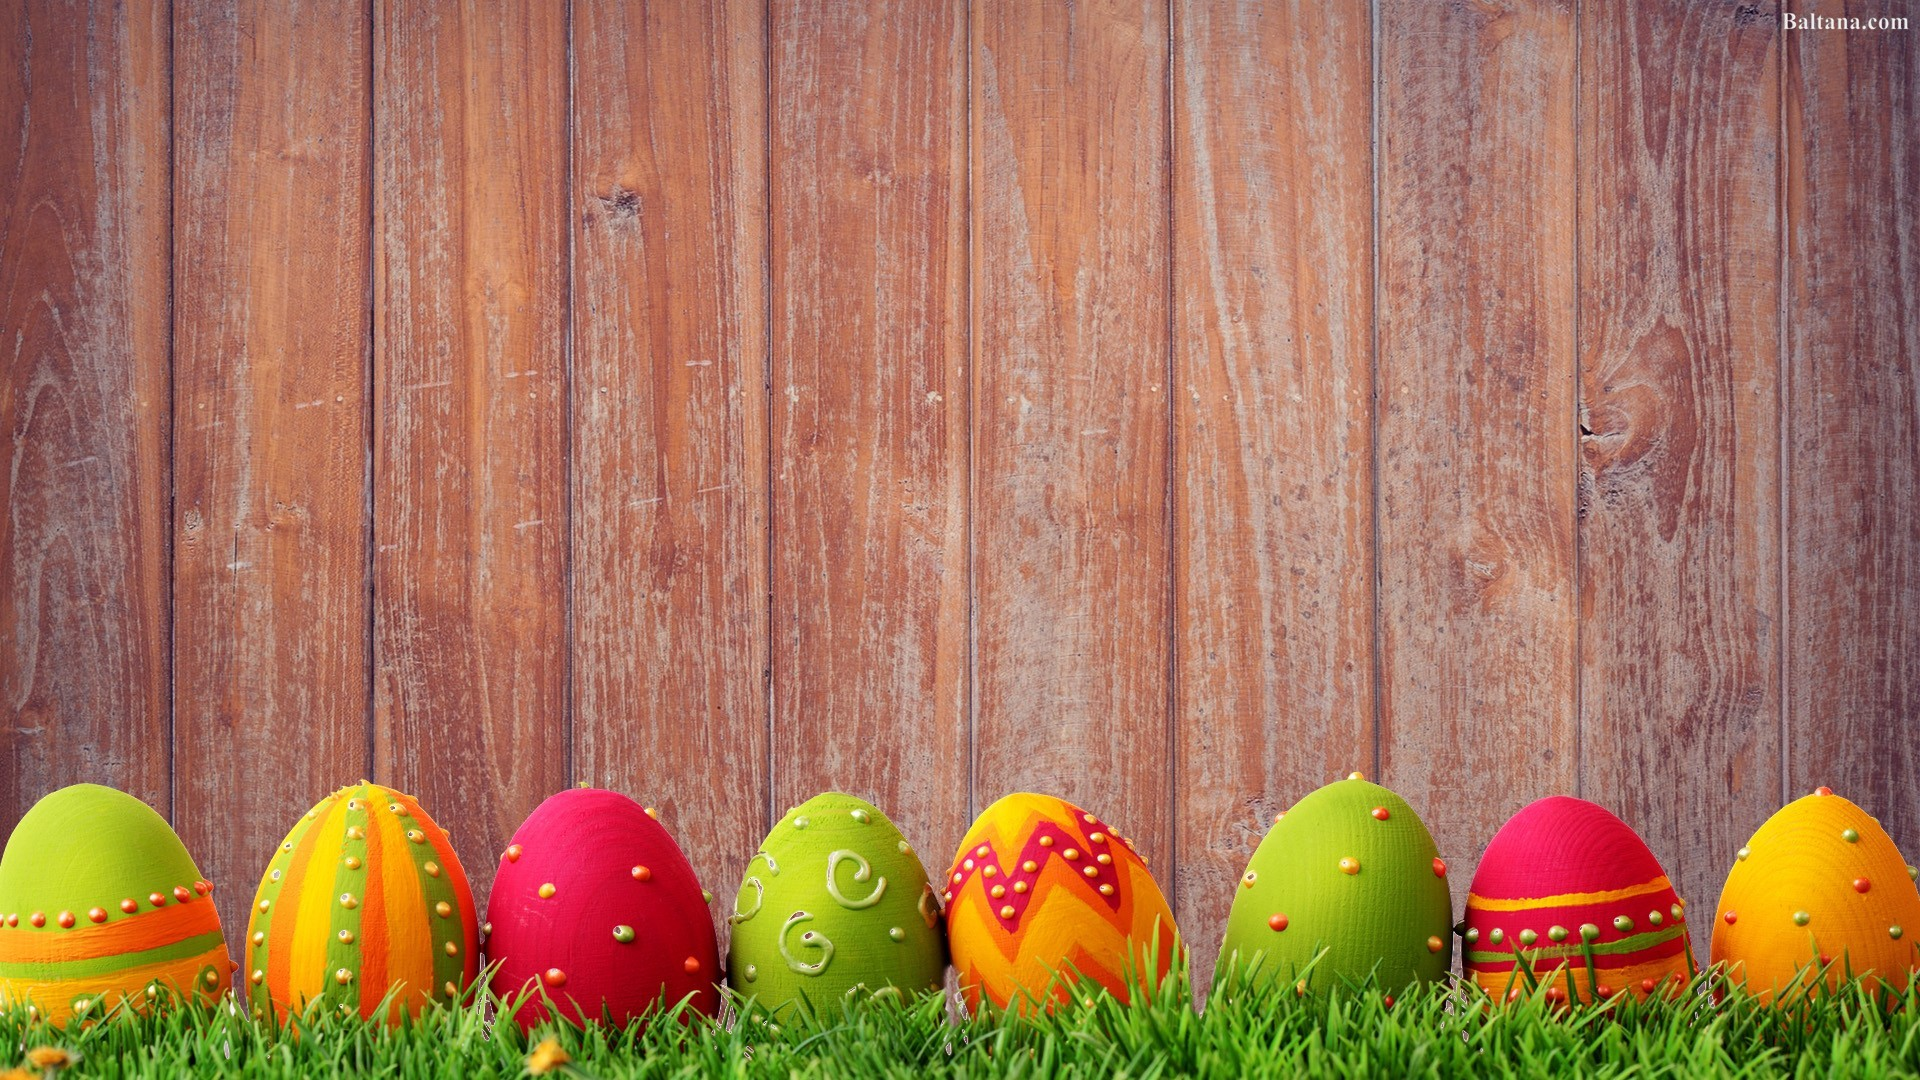 Easter Hd Desktop Wallpaper   Easter Desktop Backgrounds 930501 1920x1080